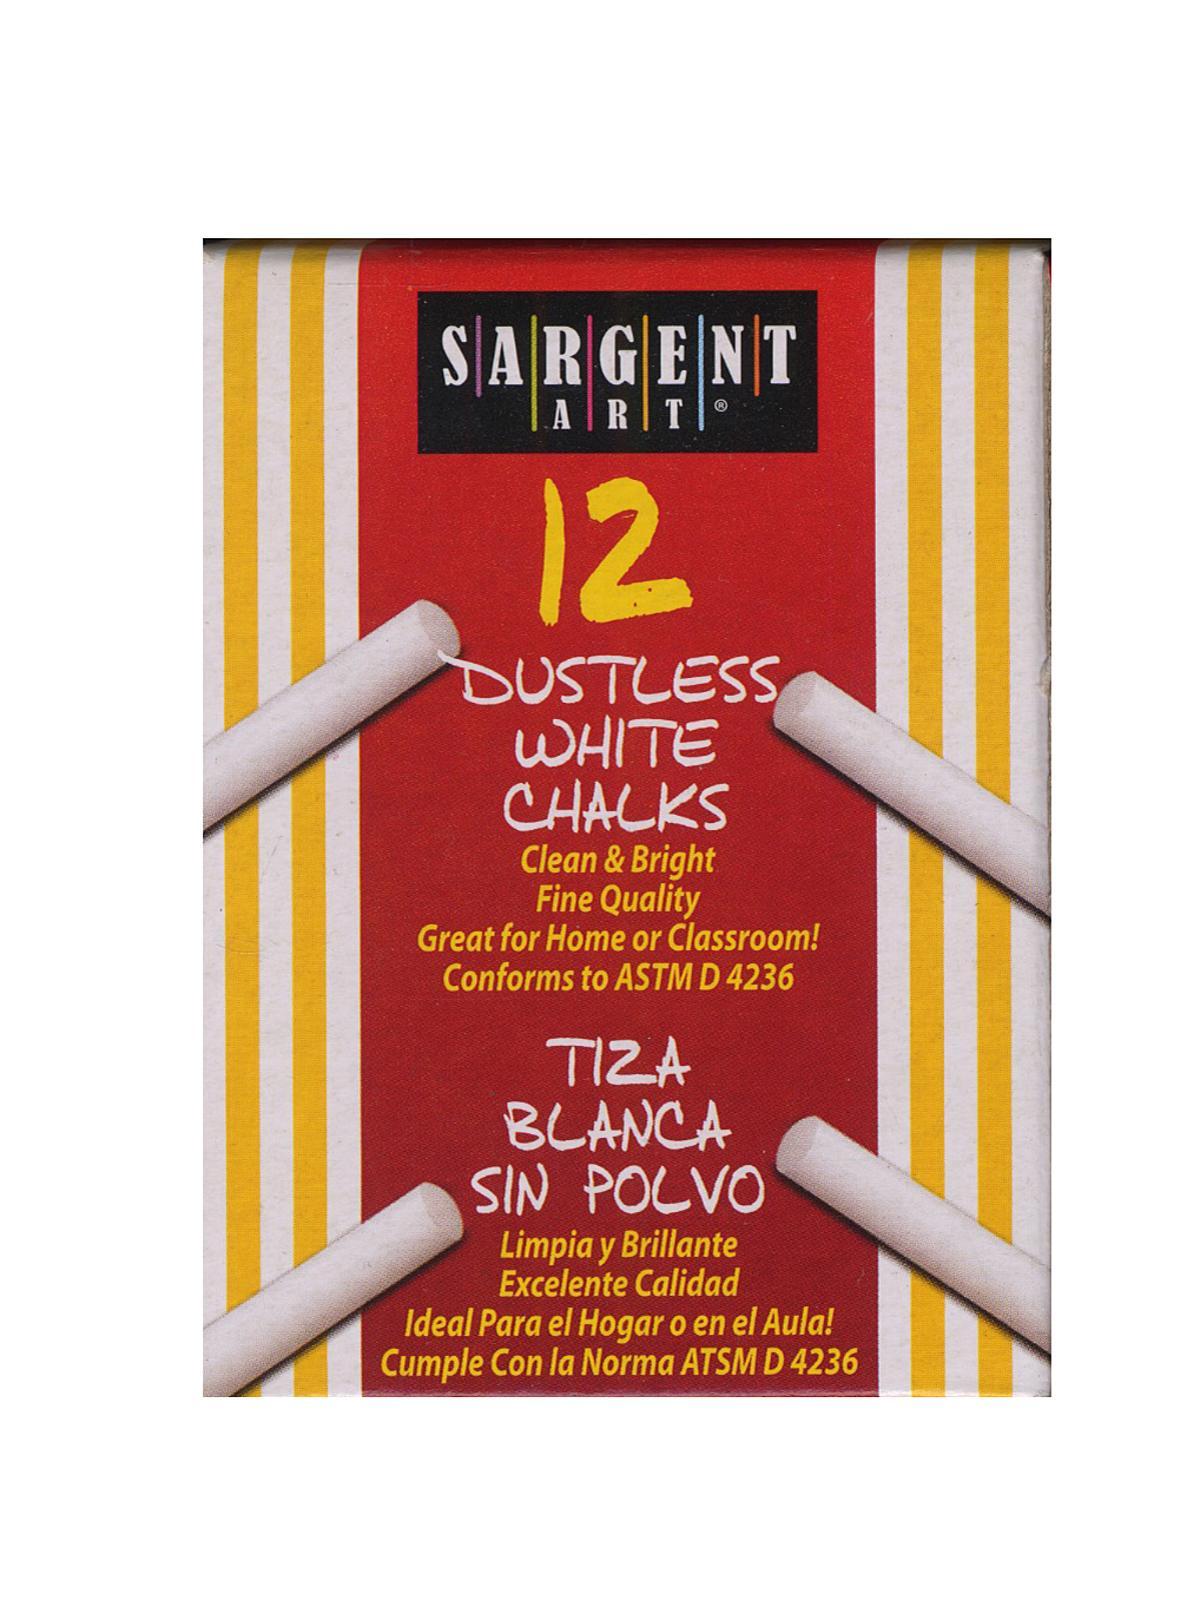 Sargent Art - Dustless Chalks